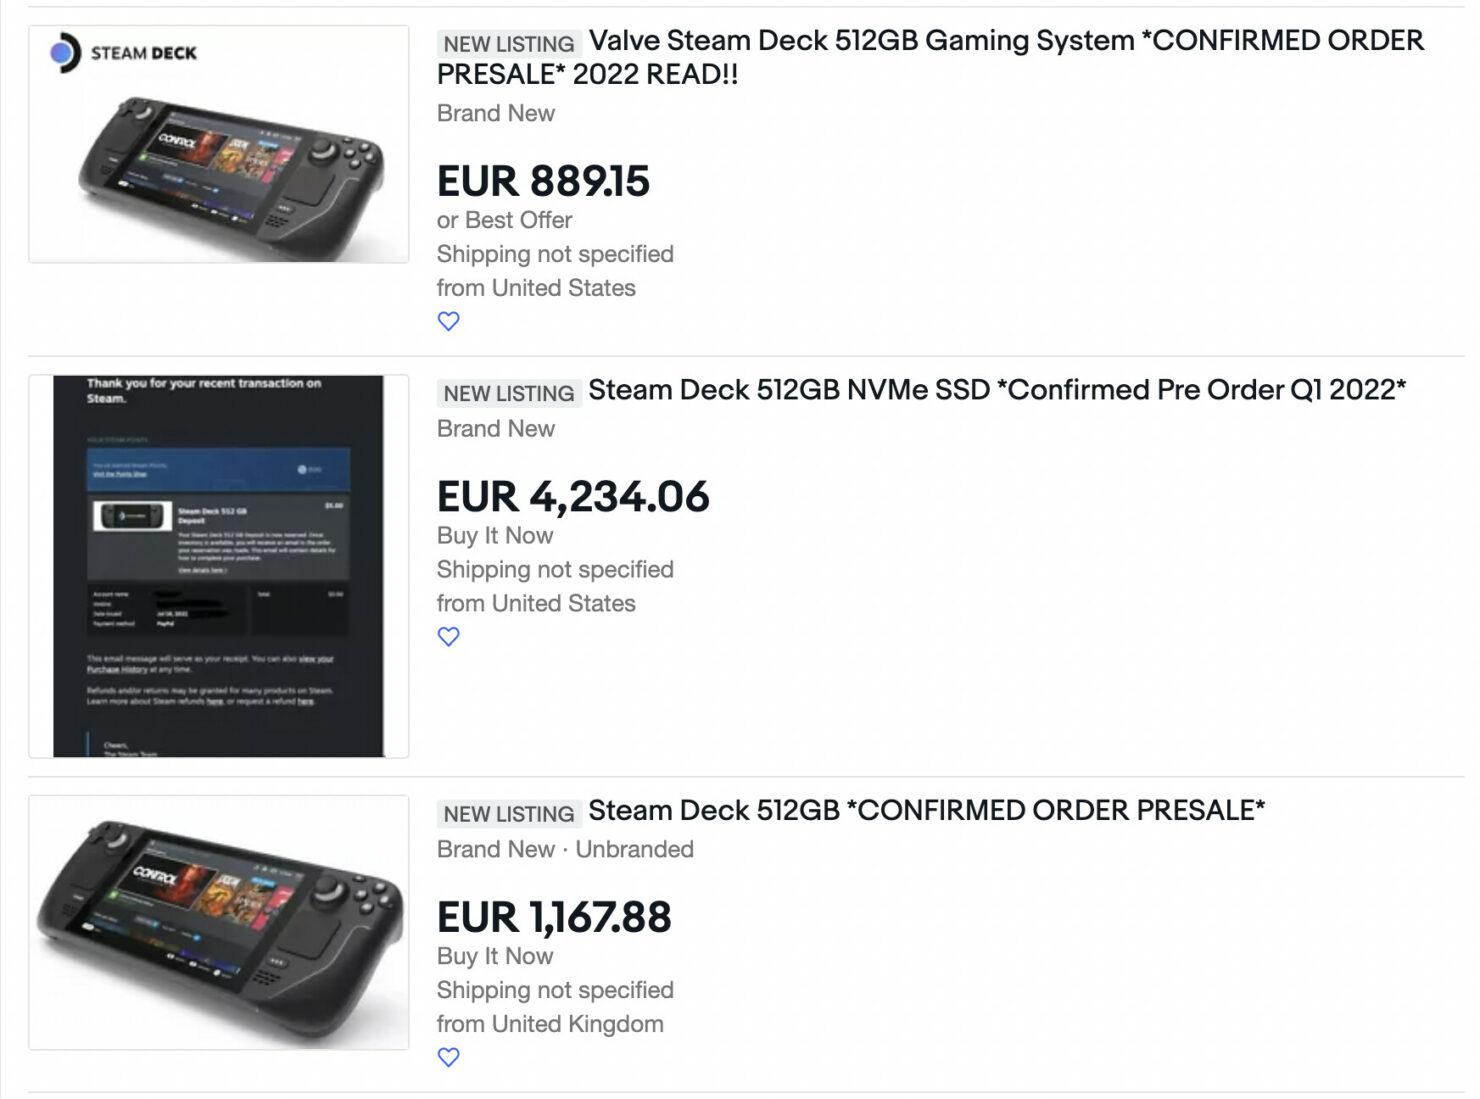 ebay-listing-for-steam-deck